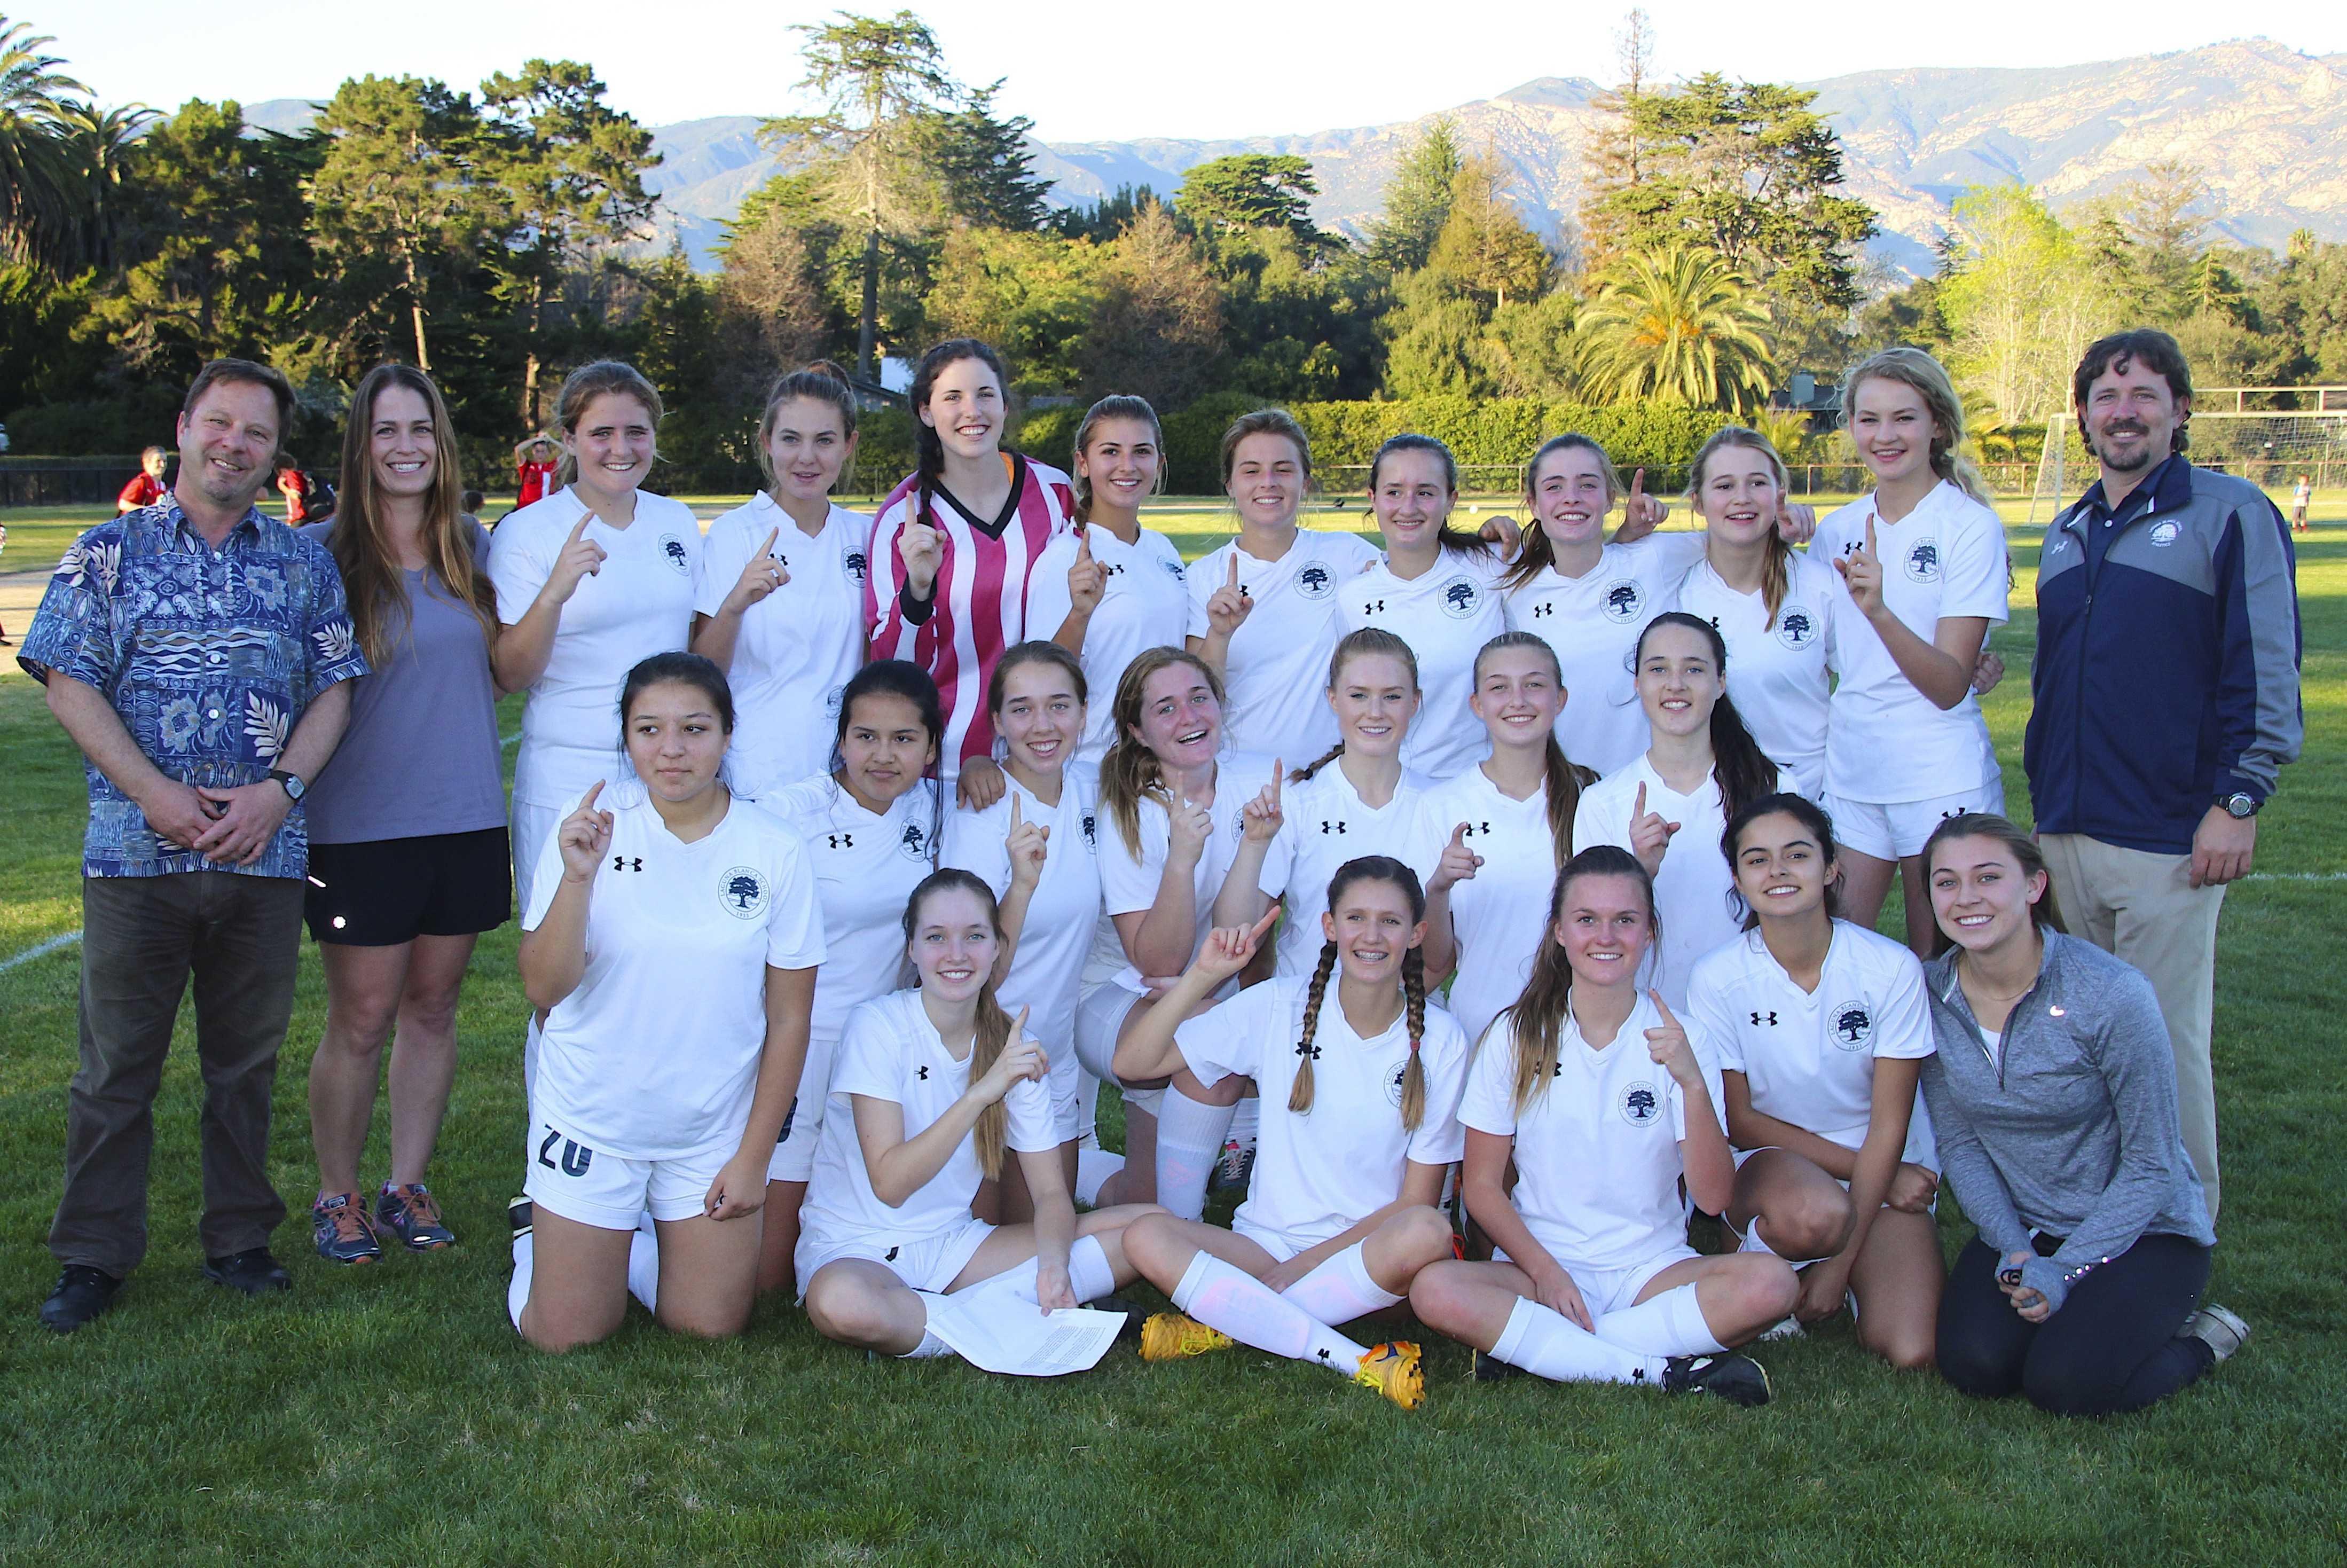 Girls Soccer Team Takes the Condor League Title